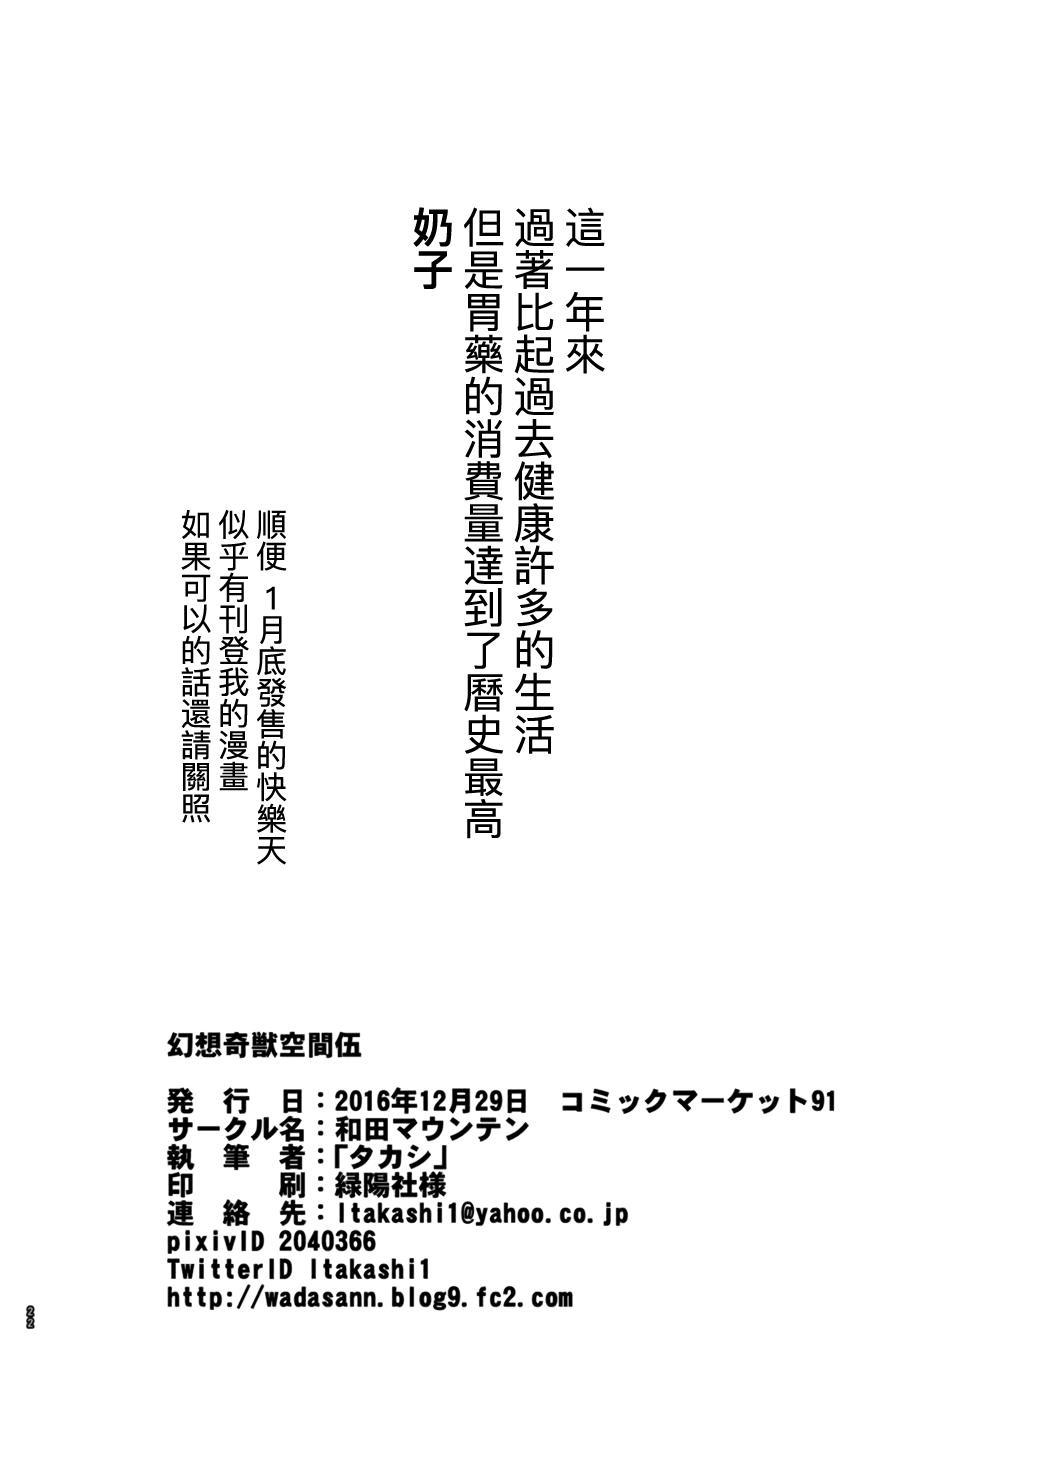 Gensou Kijuu Kuukan Go 19